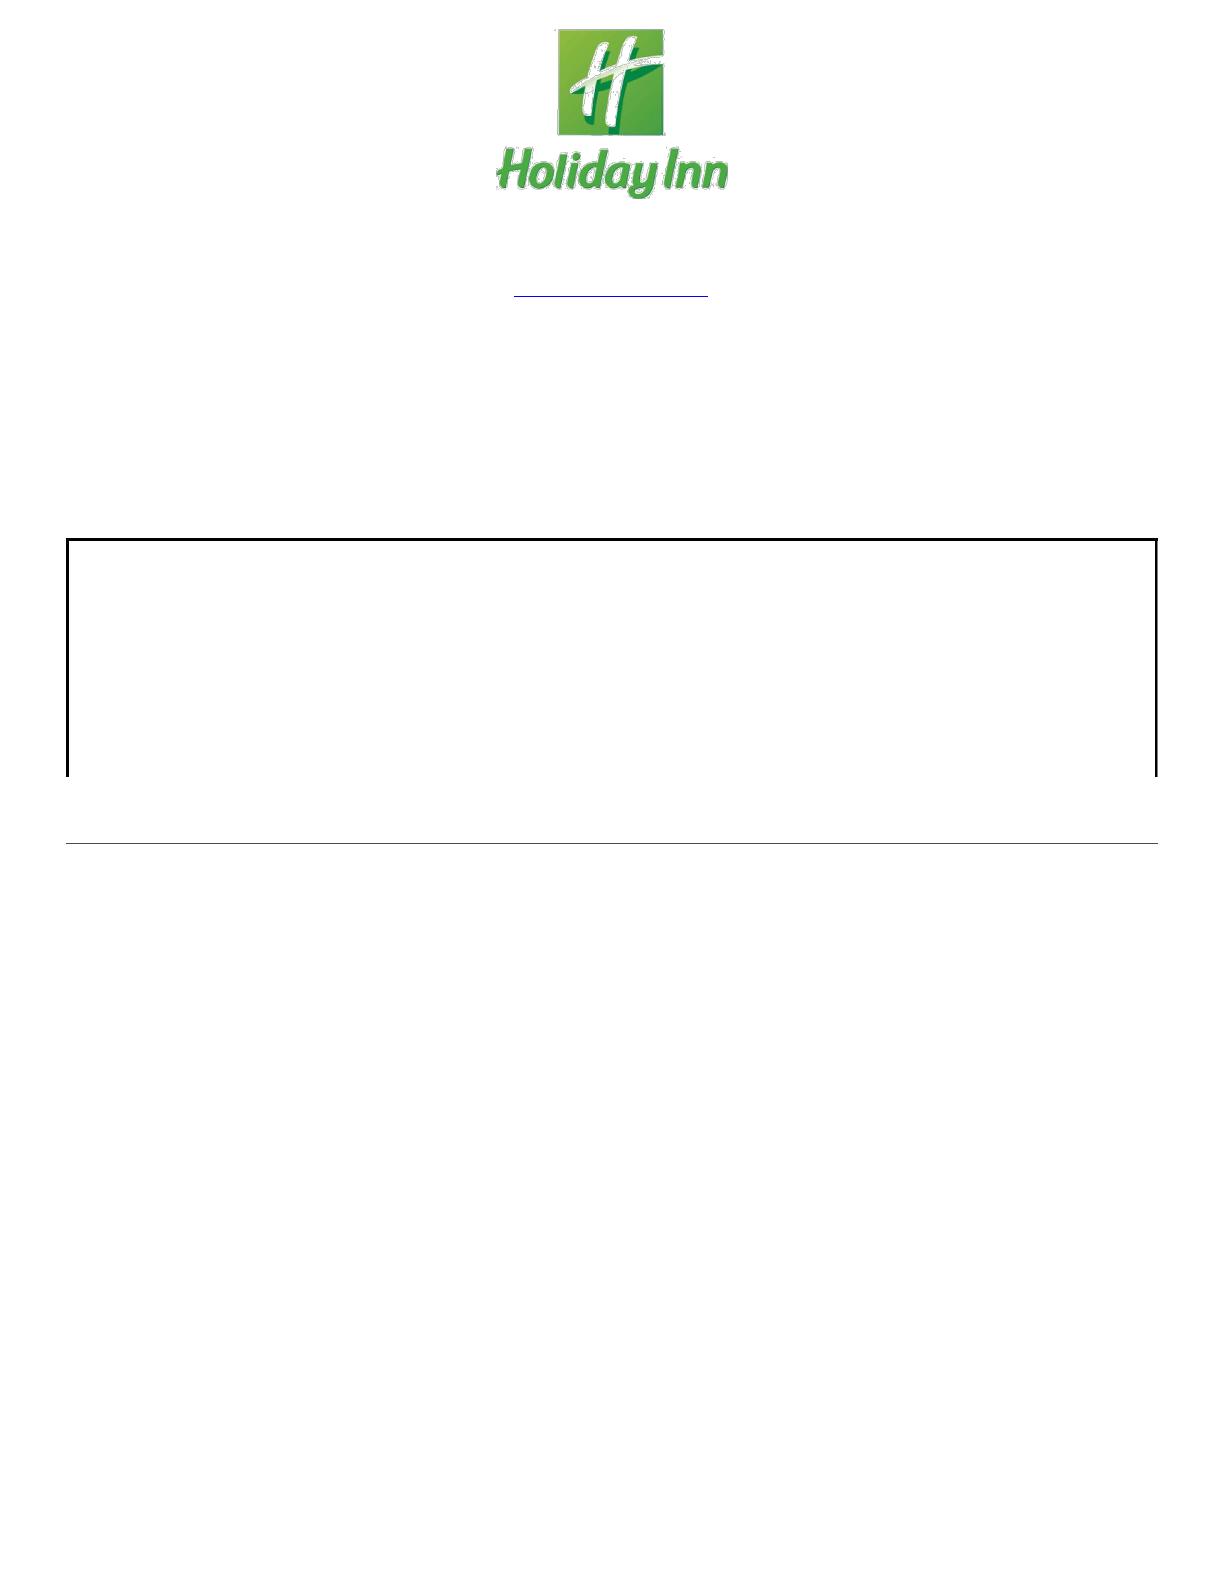 Free Printable Holiday Inn Job Application Form